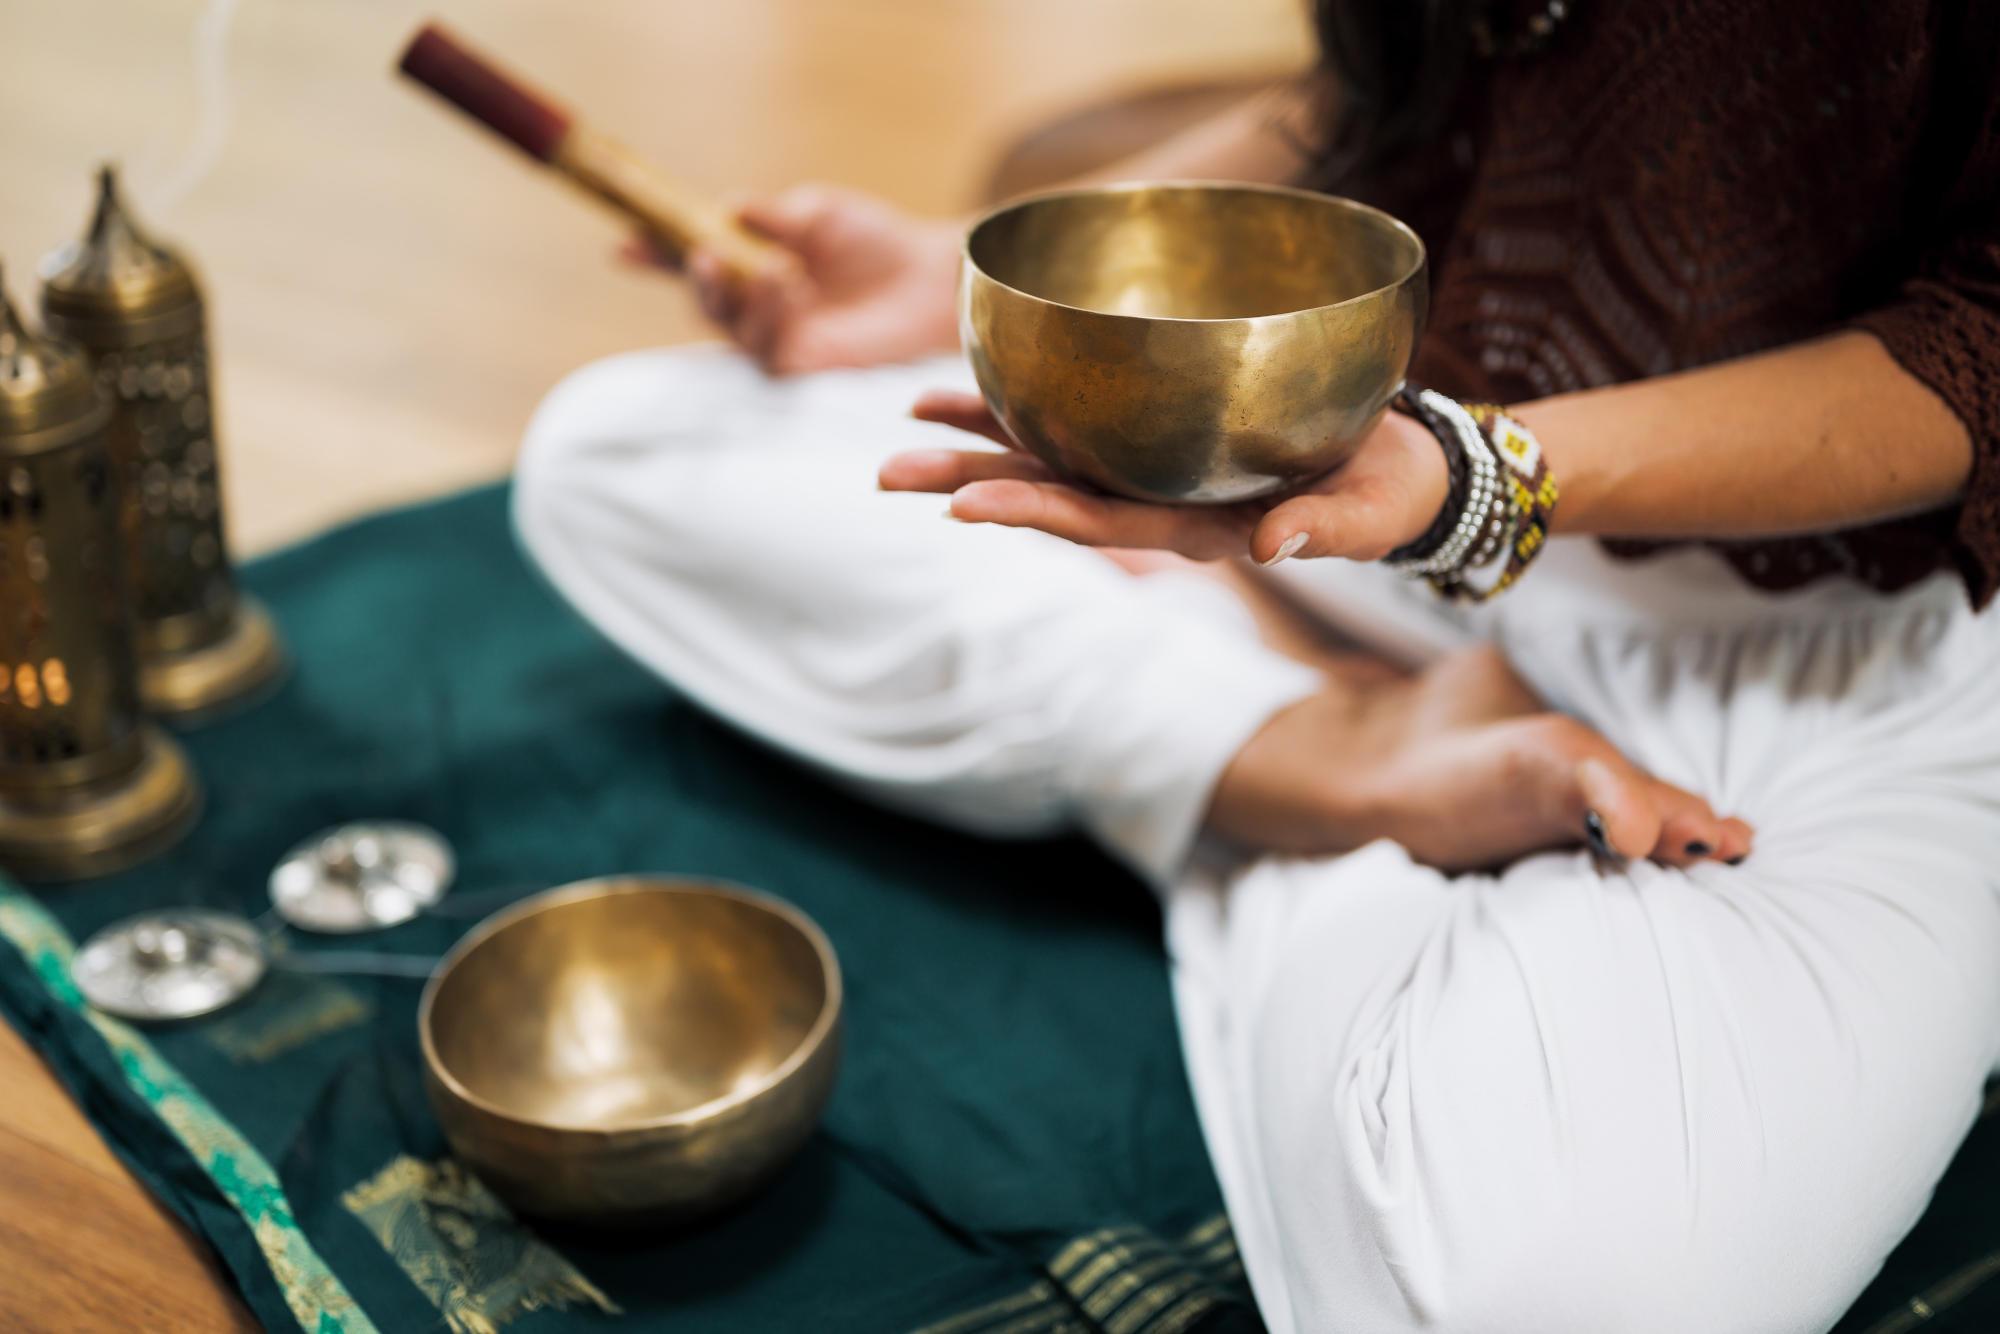 Woman with meditating bowl